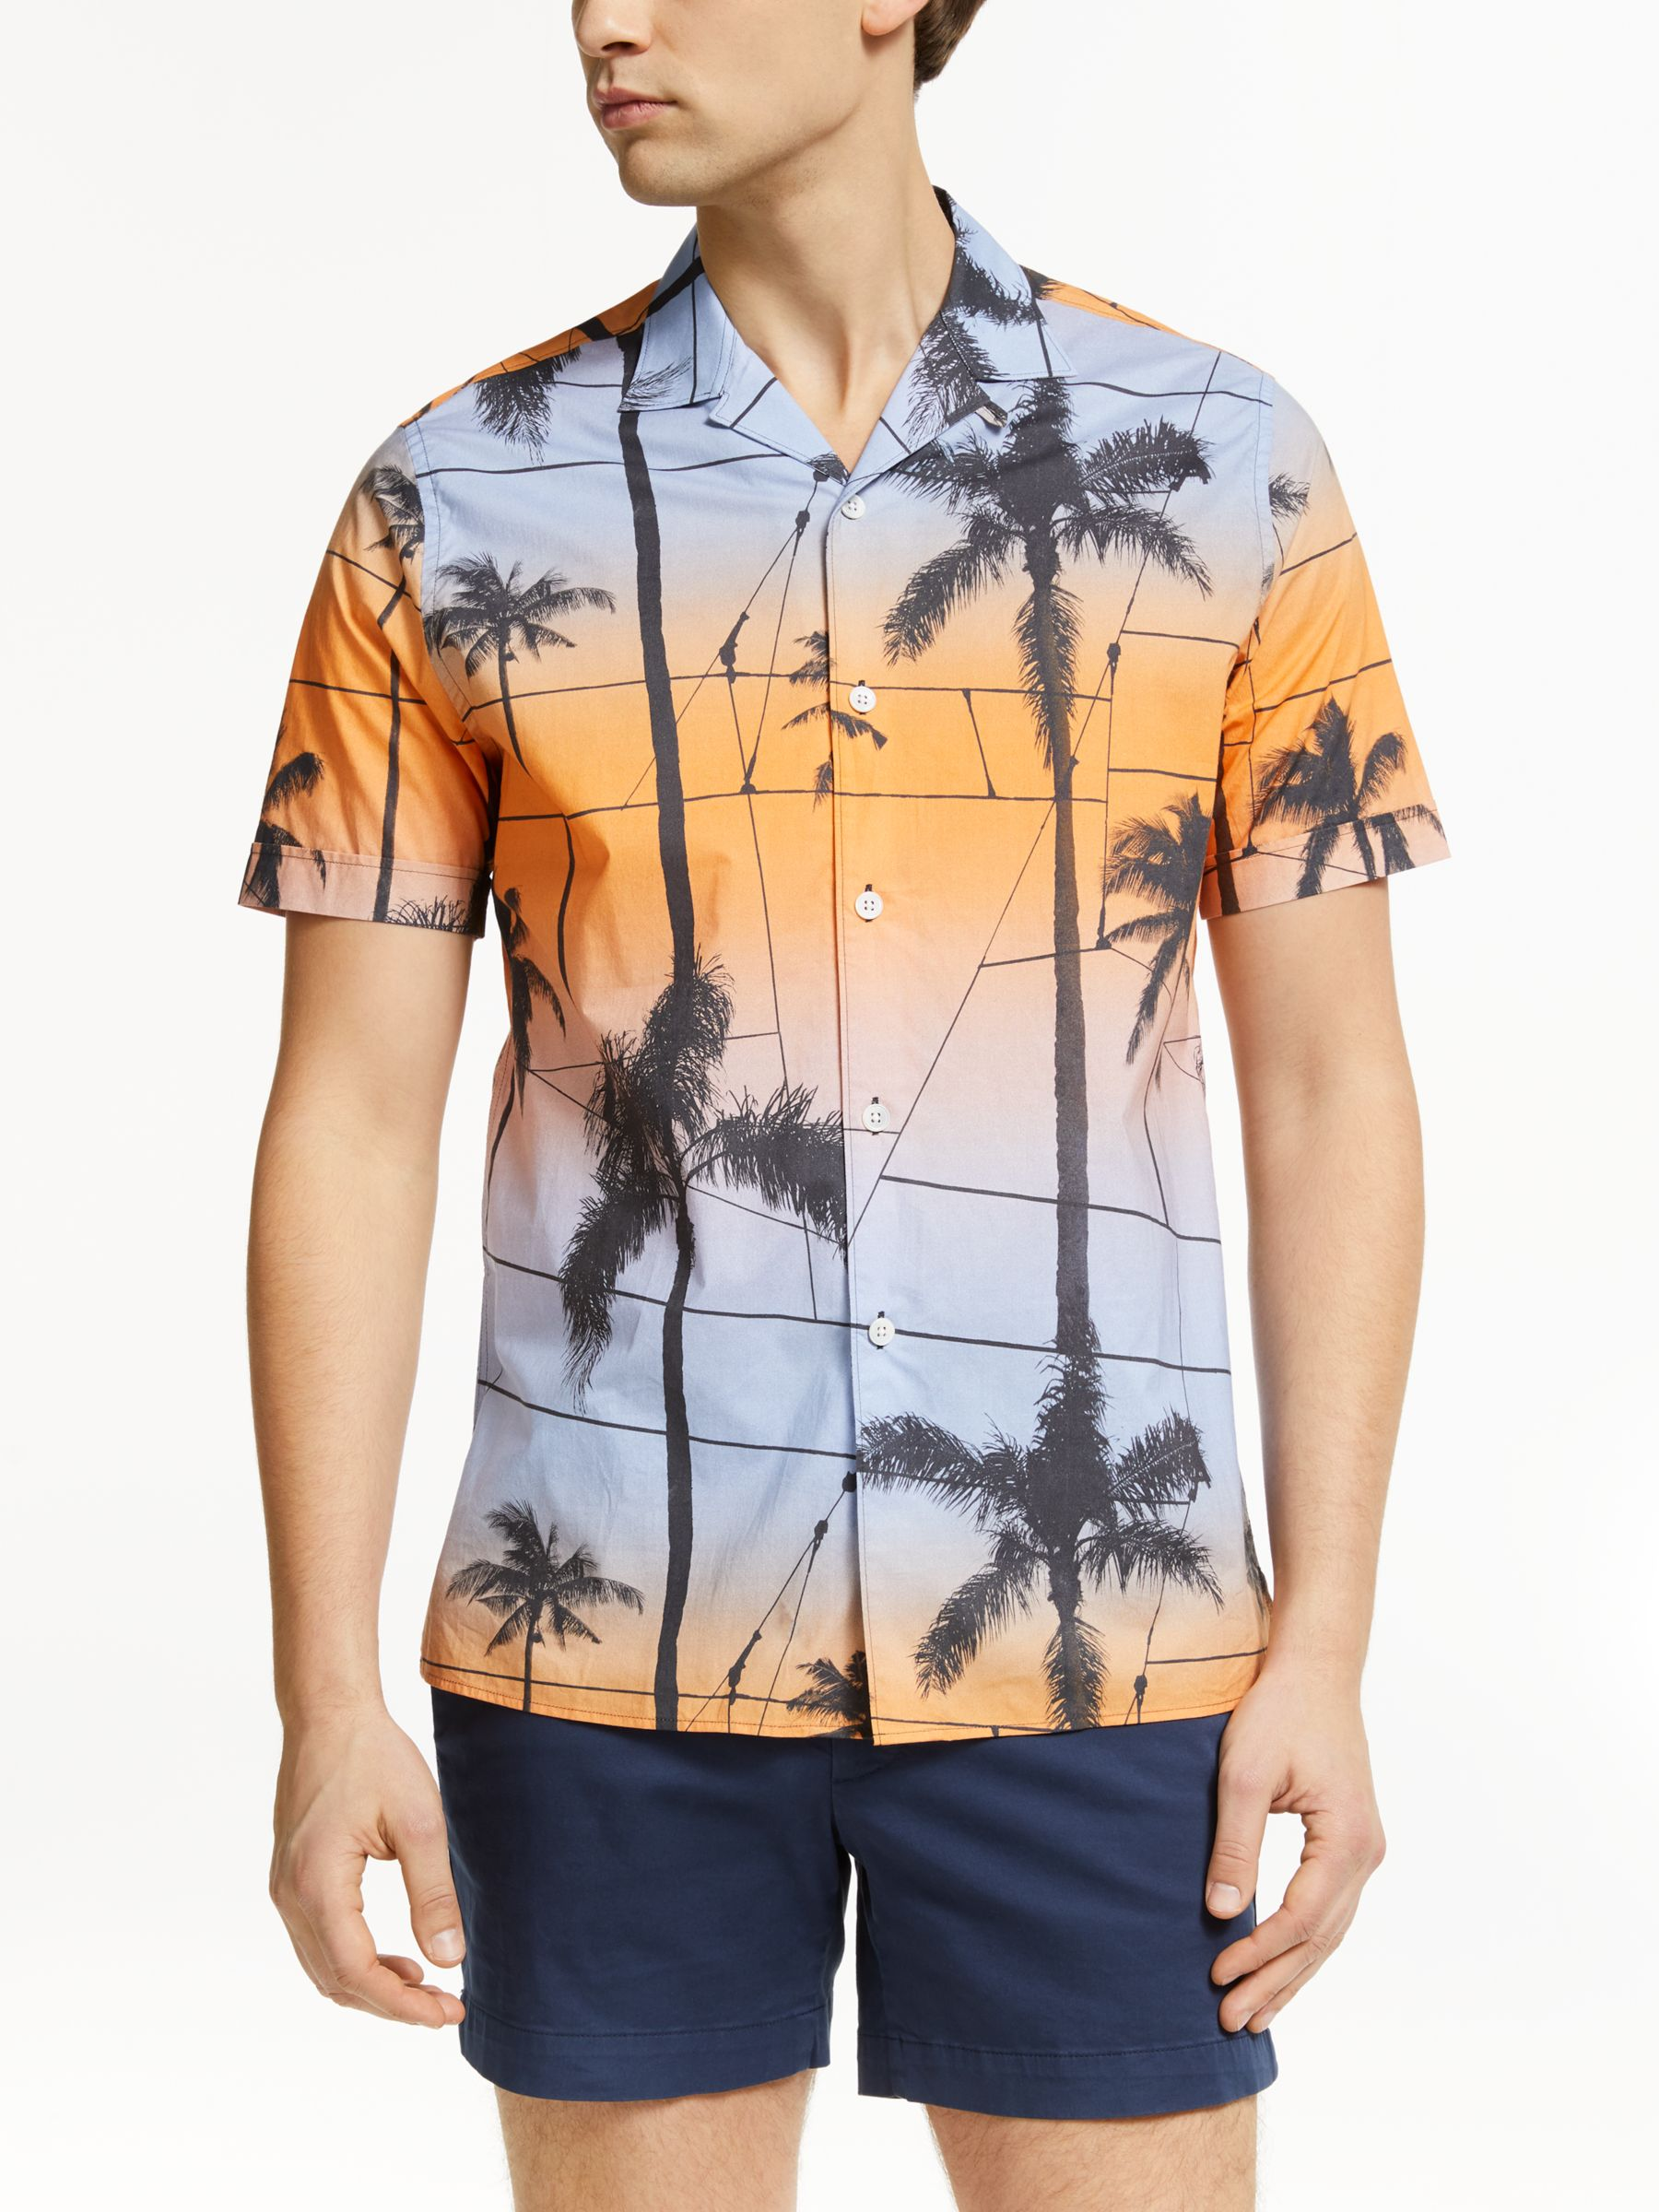 J.LINDEBERG J.Lindeberg Palm Print Shirt, Cool Peach